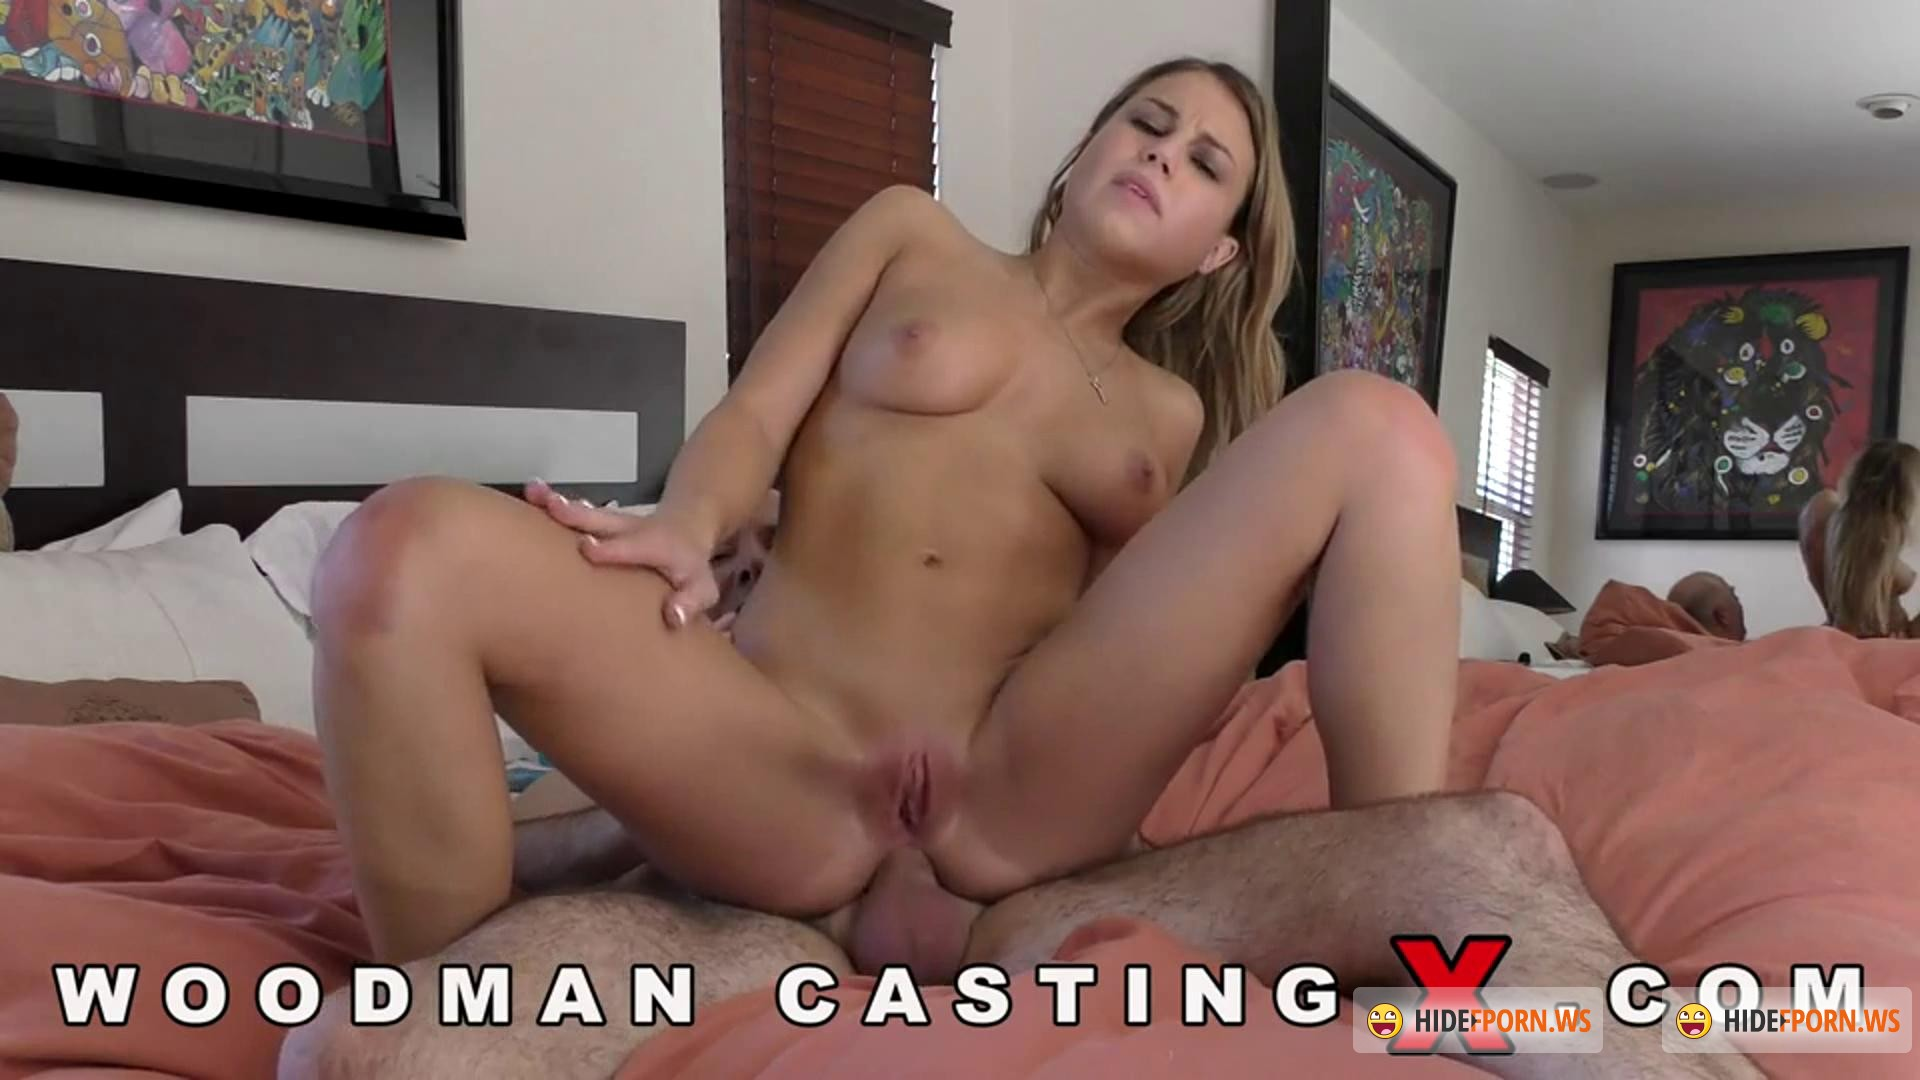 Live casting порно онлайн наступающим